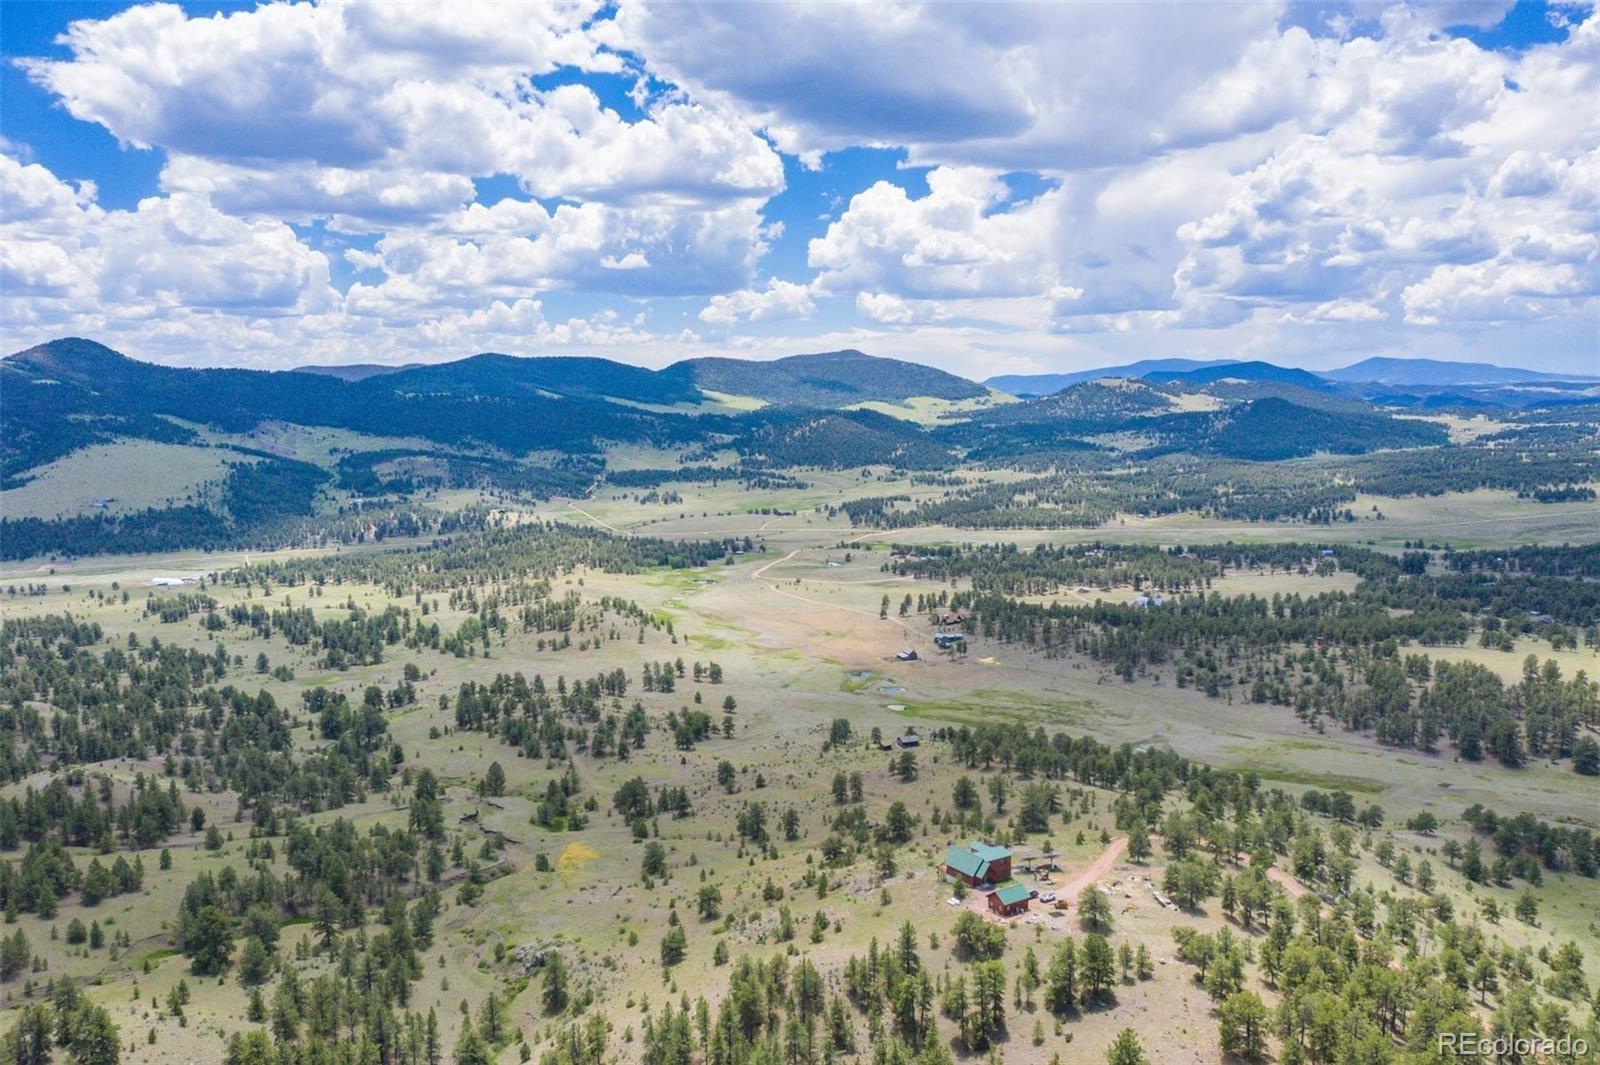 MLS# 8182693 - 2 - 396 Eagle Nest Trail, Guffey, CO 80820